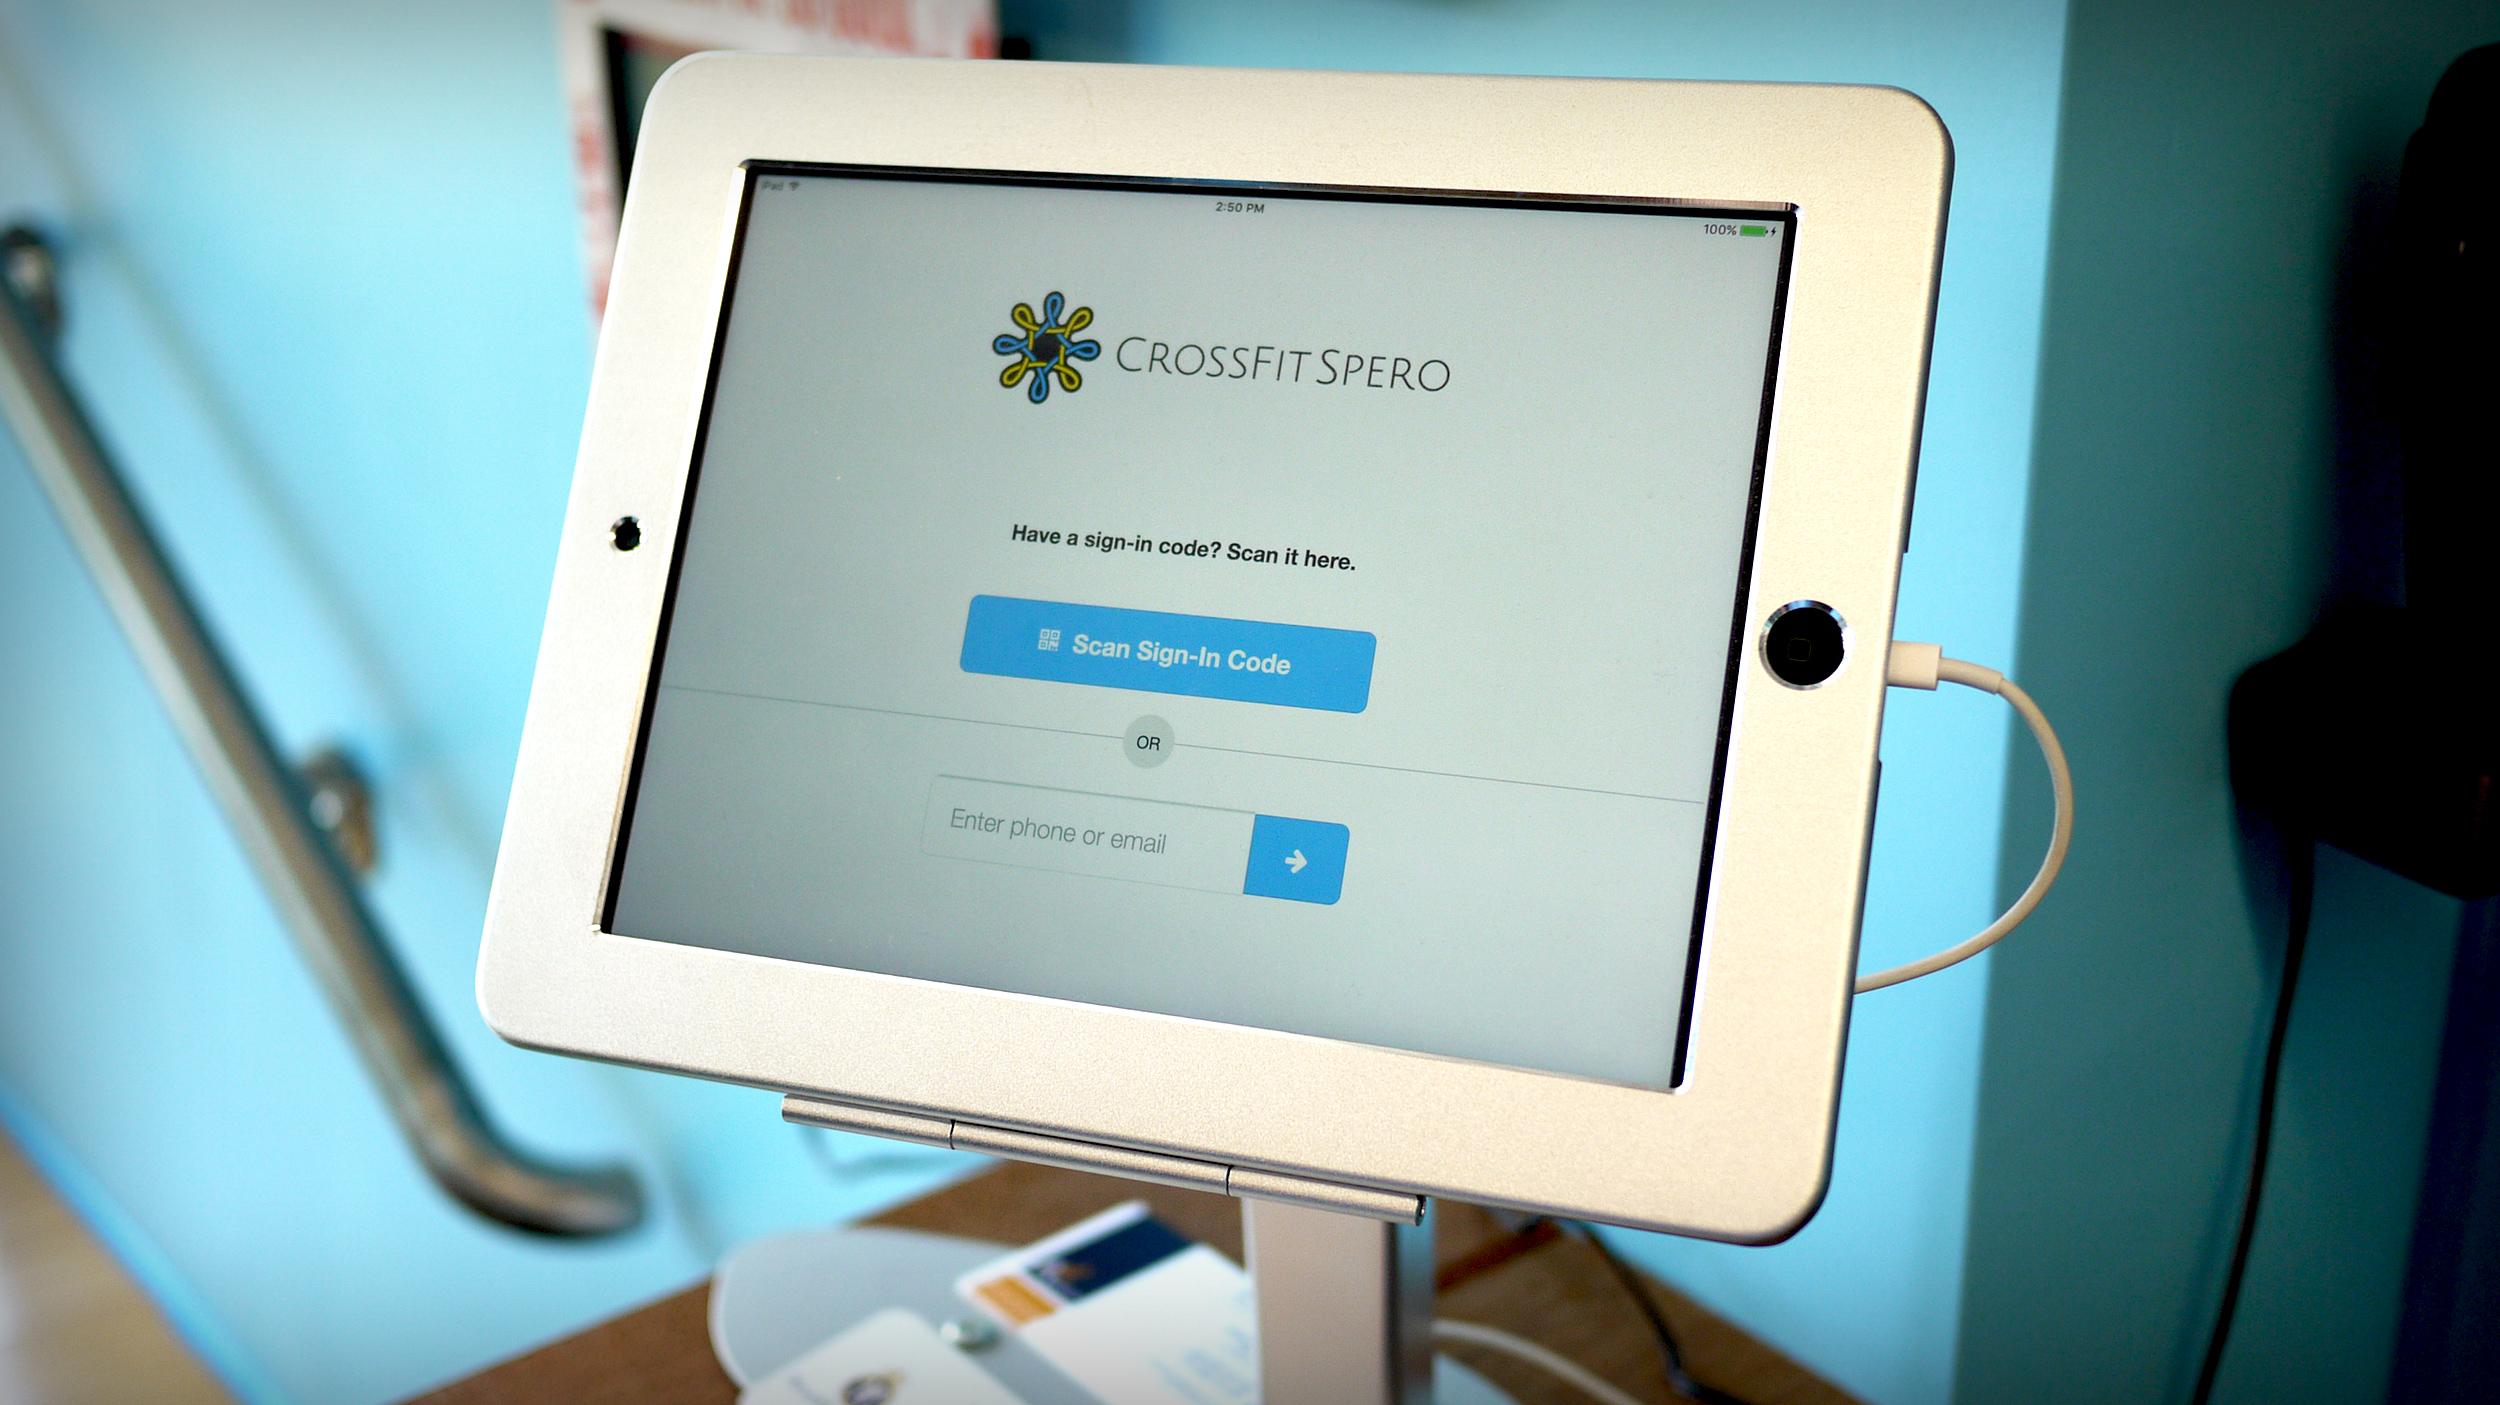 Crossfit Spero sign-in screen